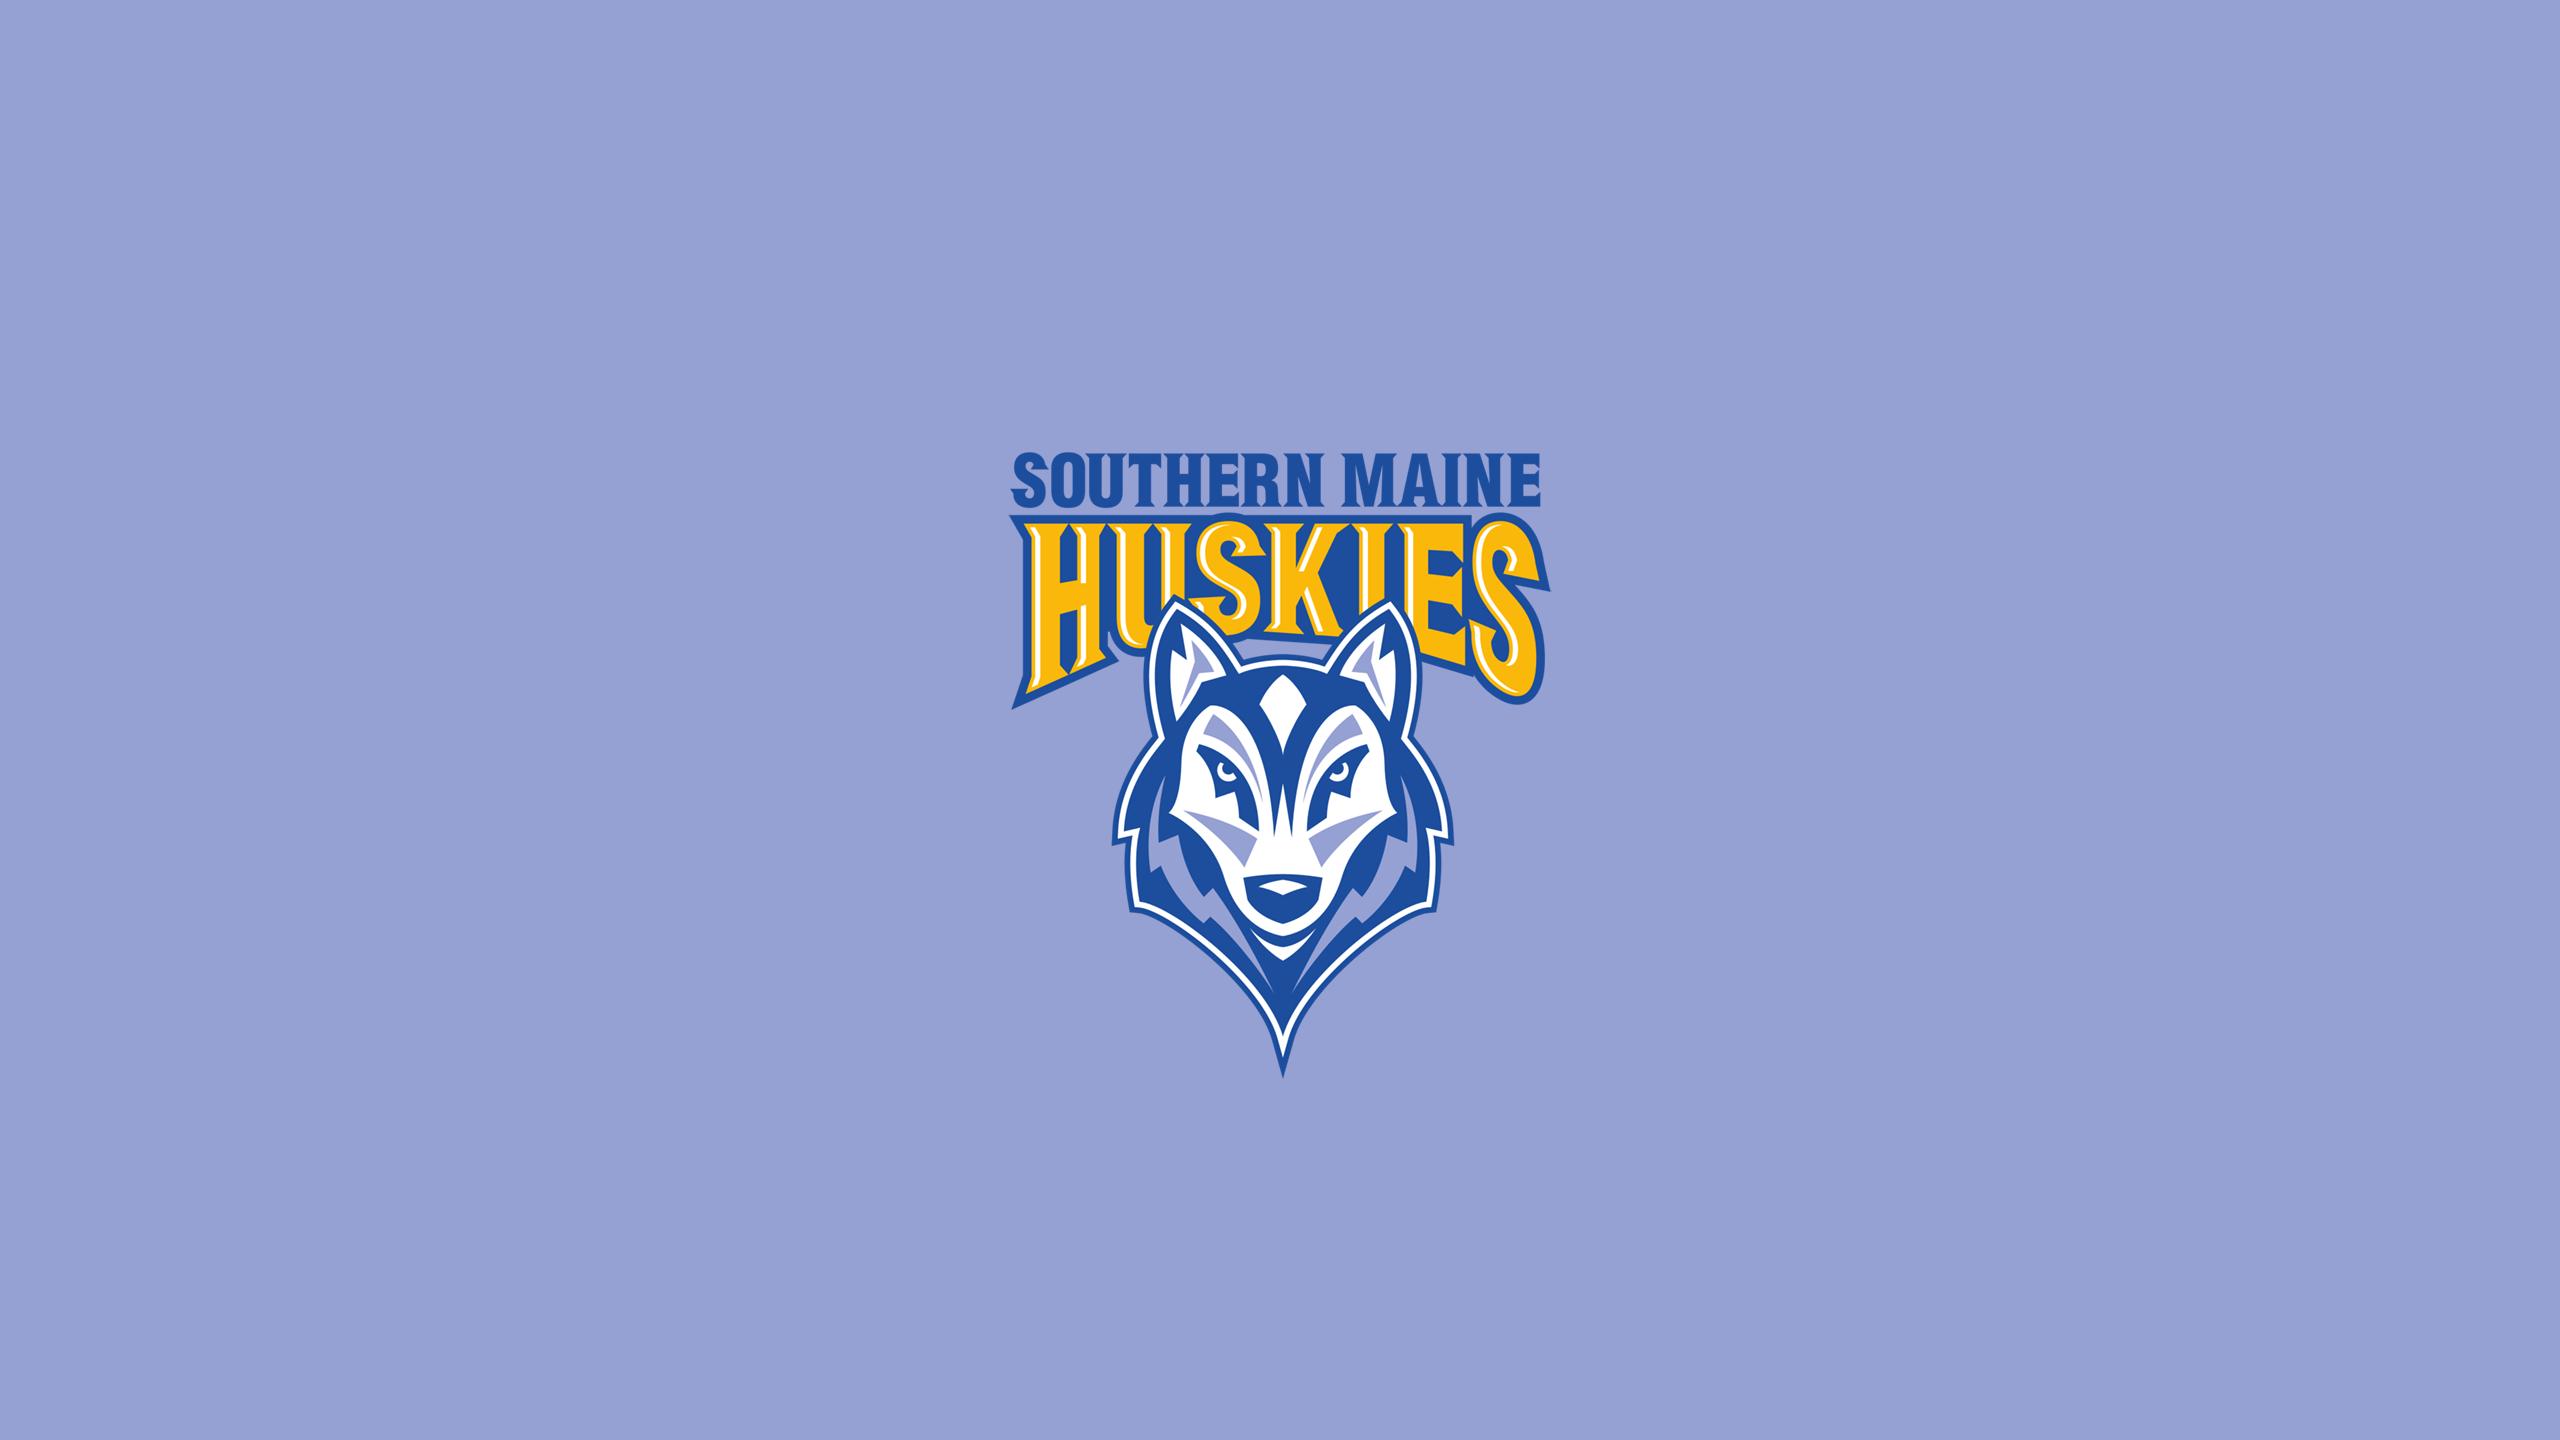 University of Southern Maine Huskies